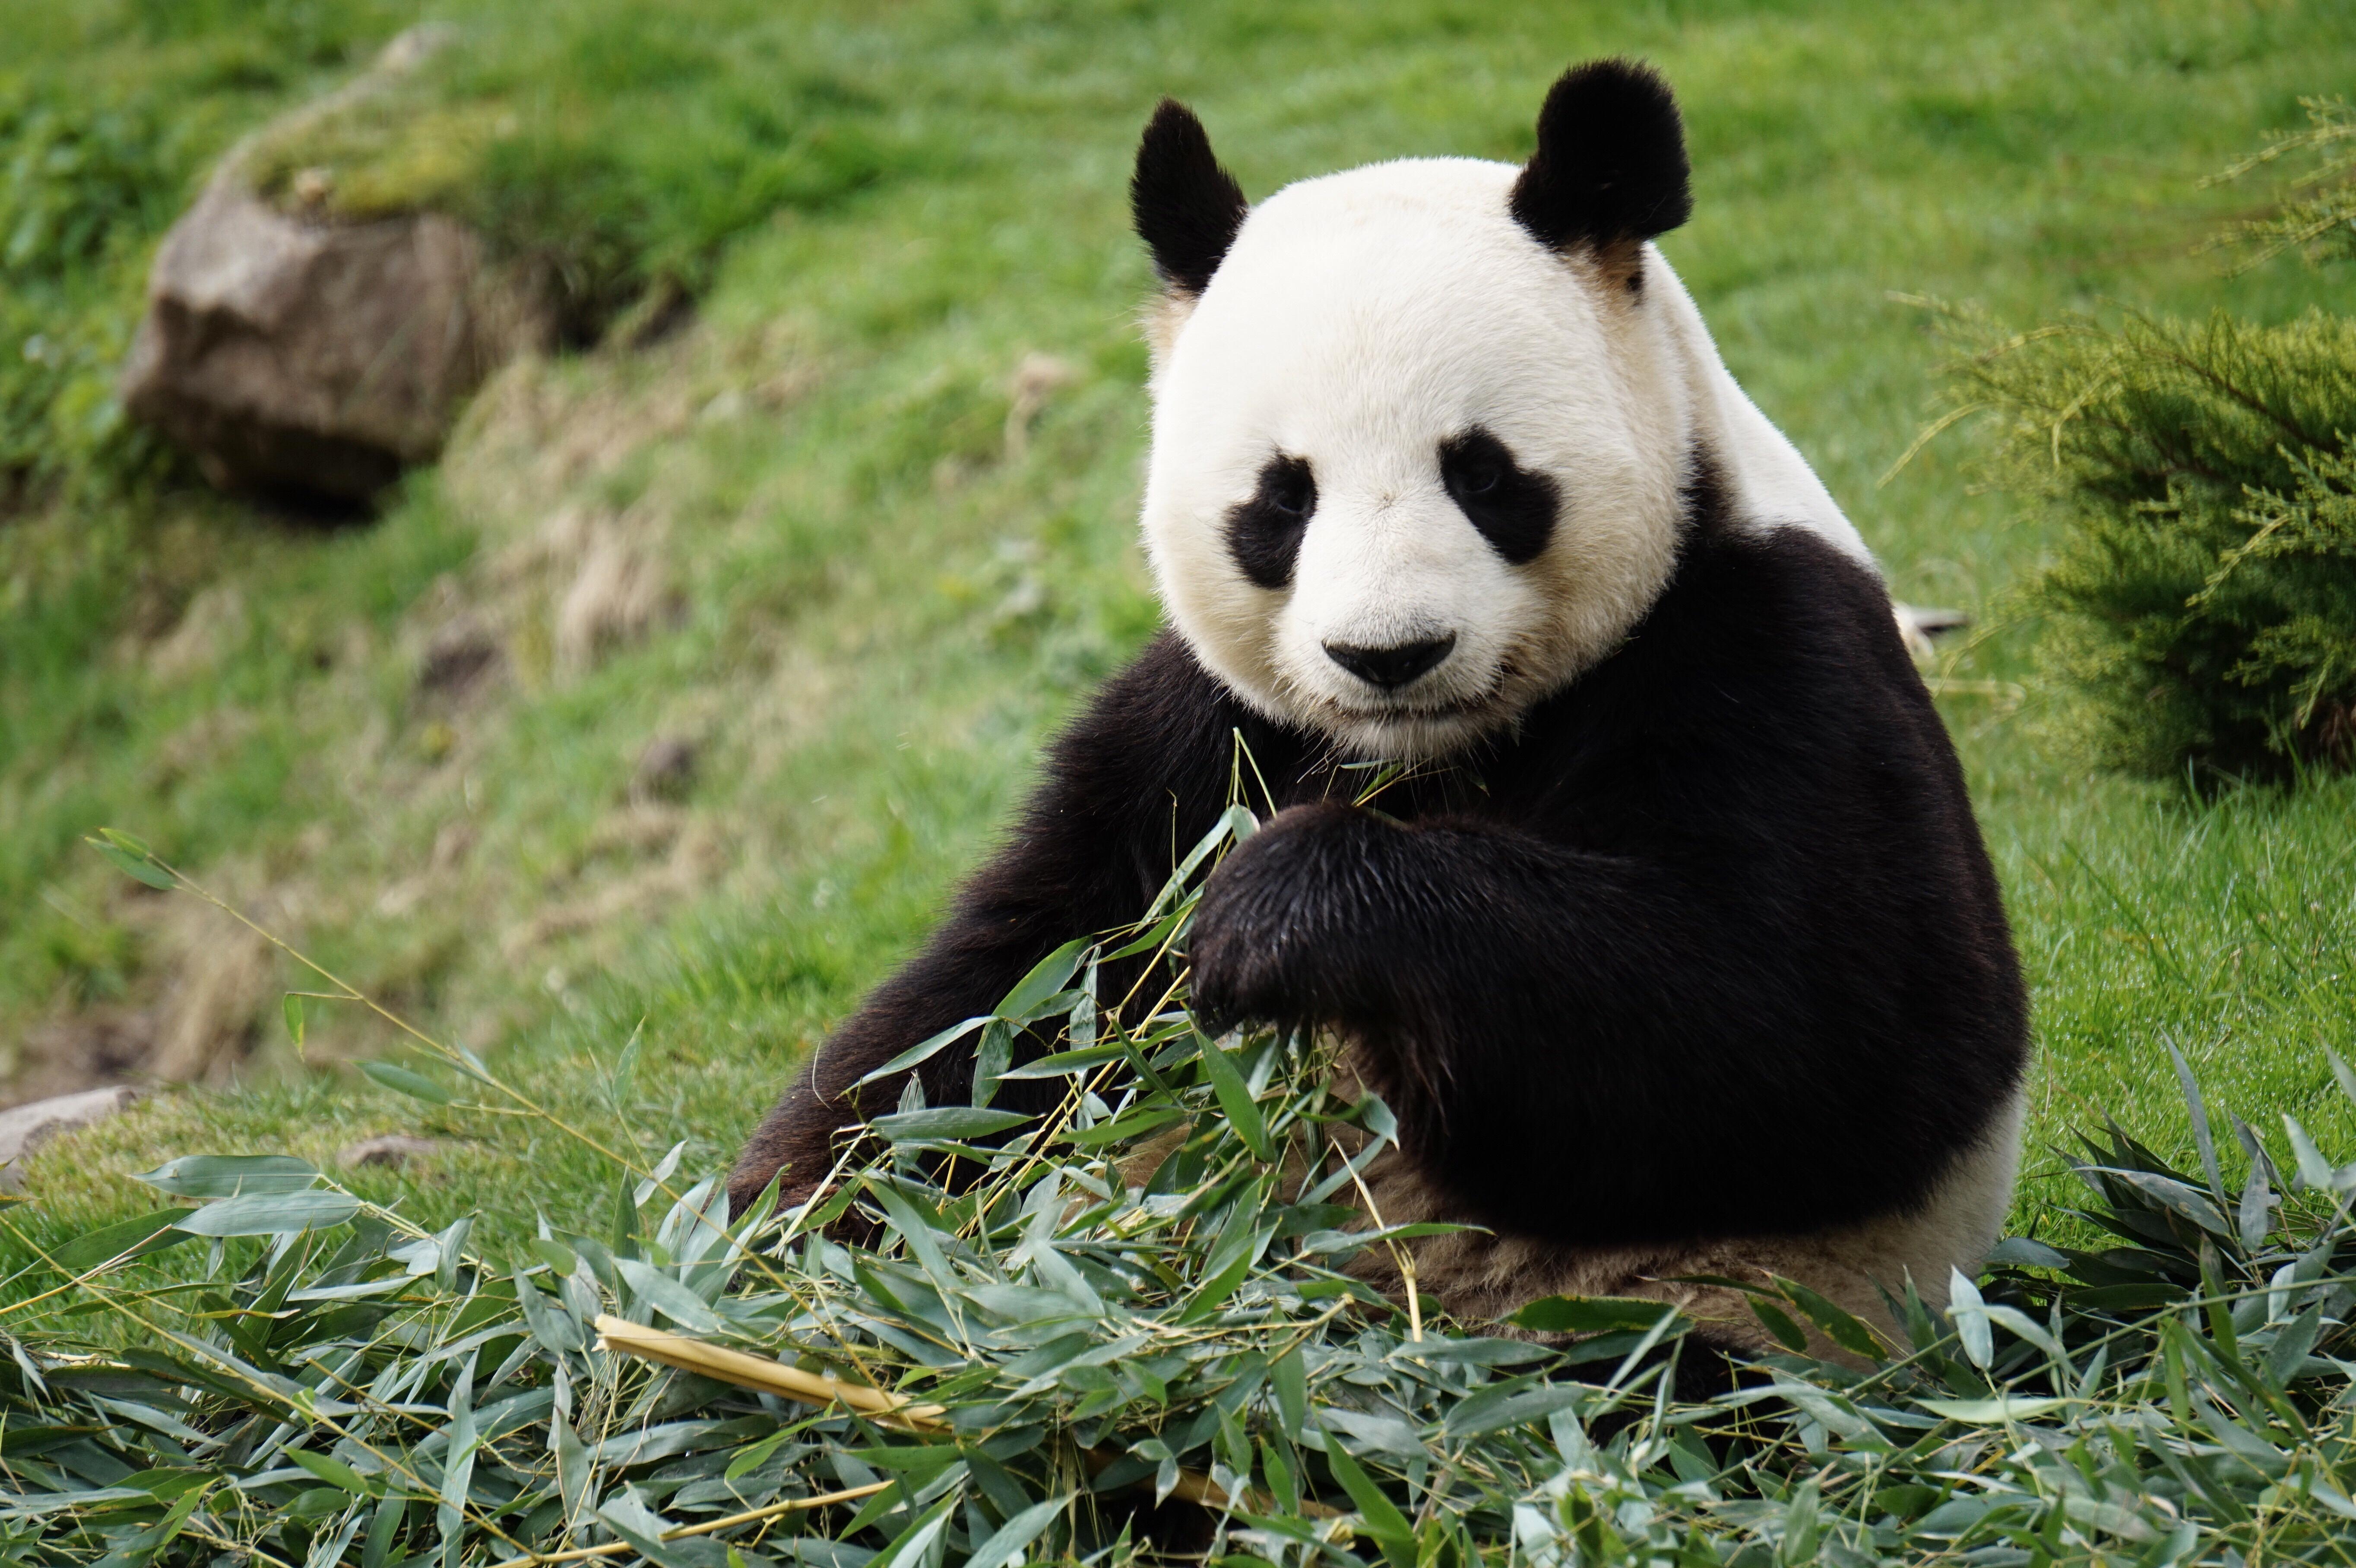 Download mobile wallpaper Bamboo, Panda, Animals, Animal, Funny for free.